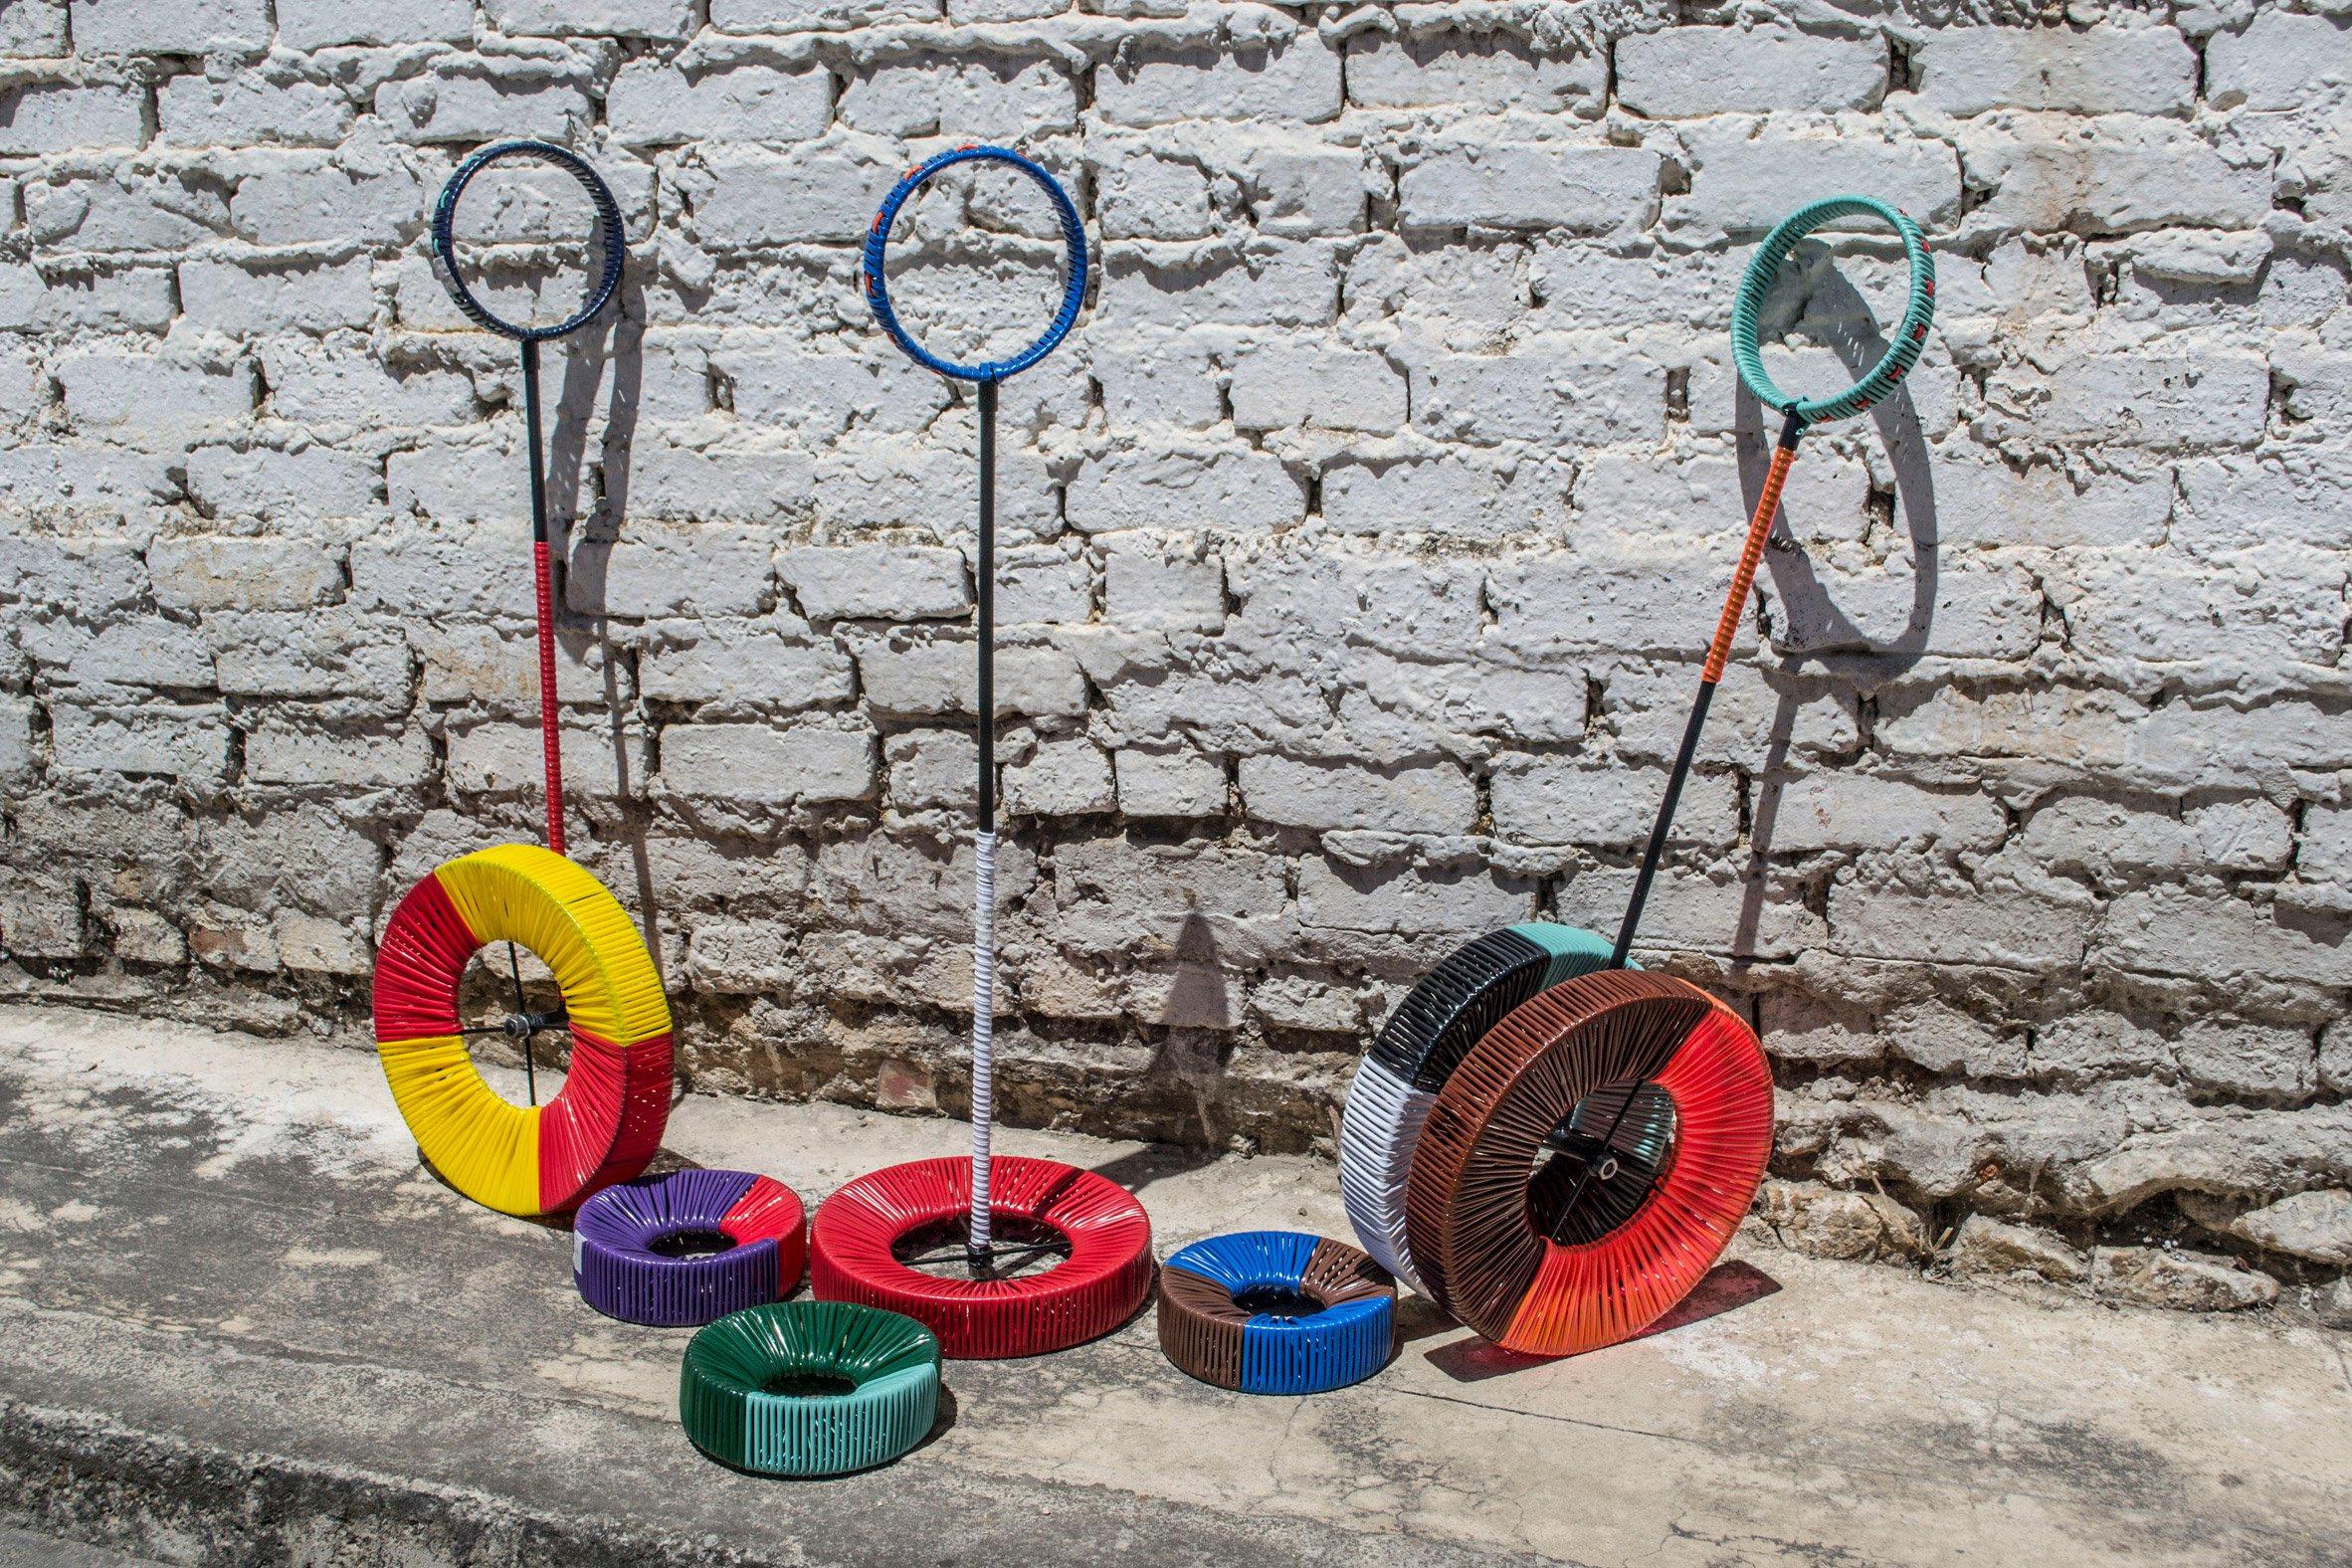 marni-playland-milan-design-week-furniture-toys-weaving-installation-chairs-_dezeen_2364_col_5